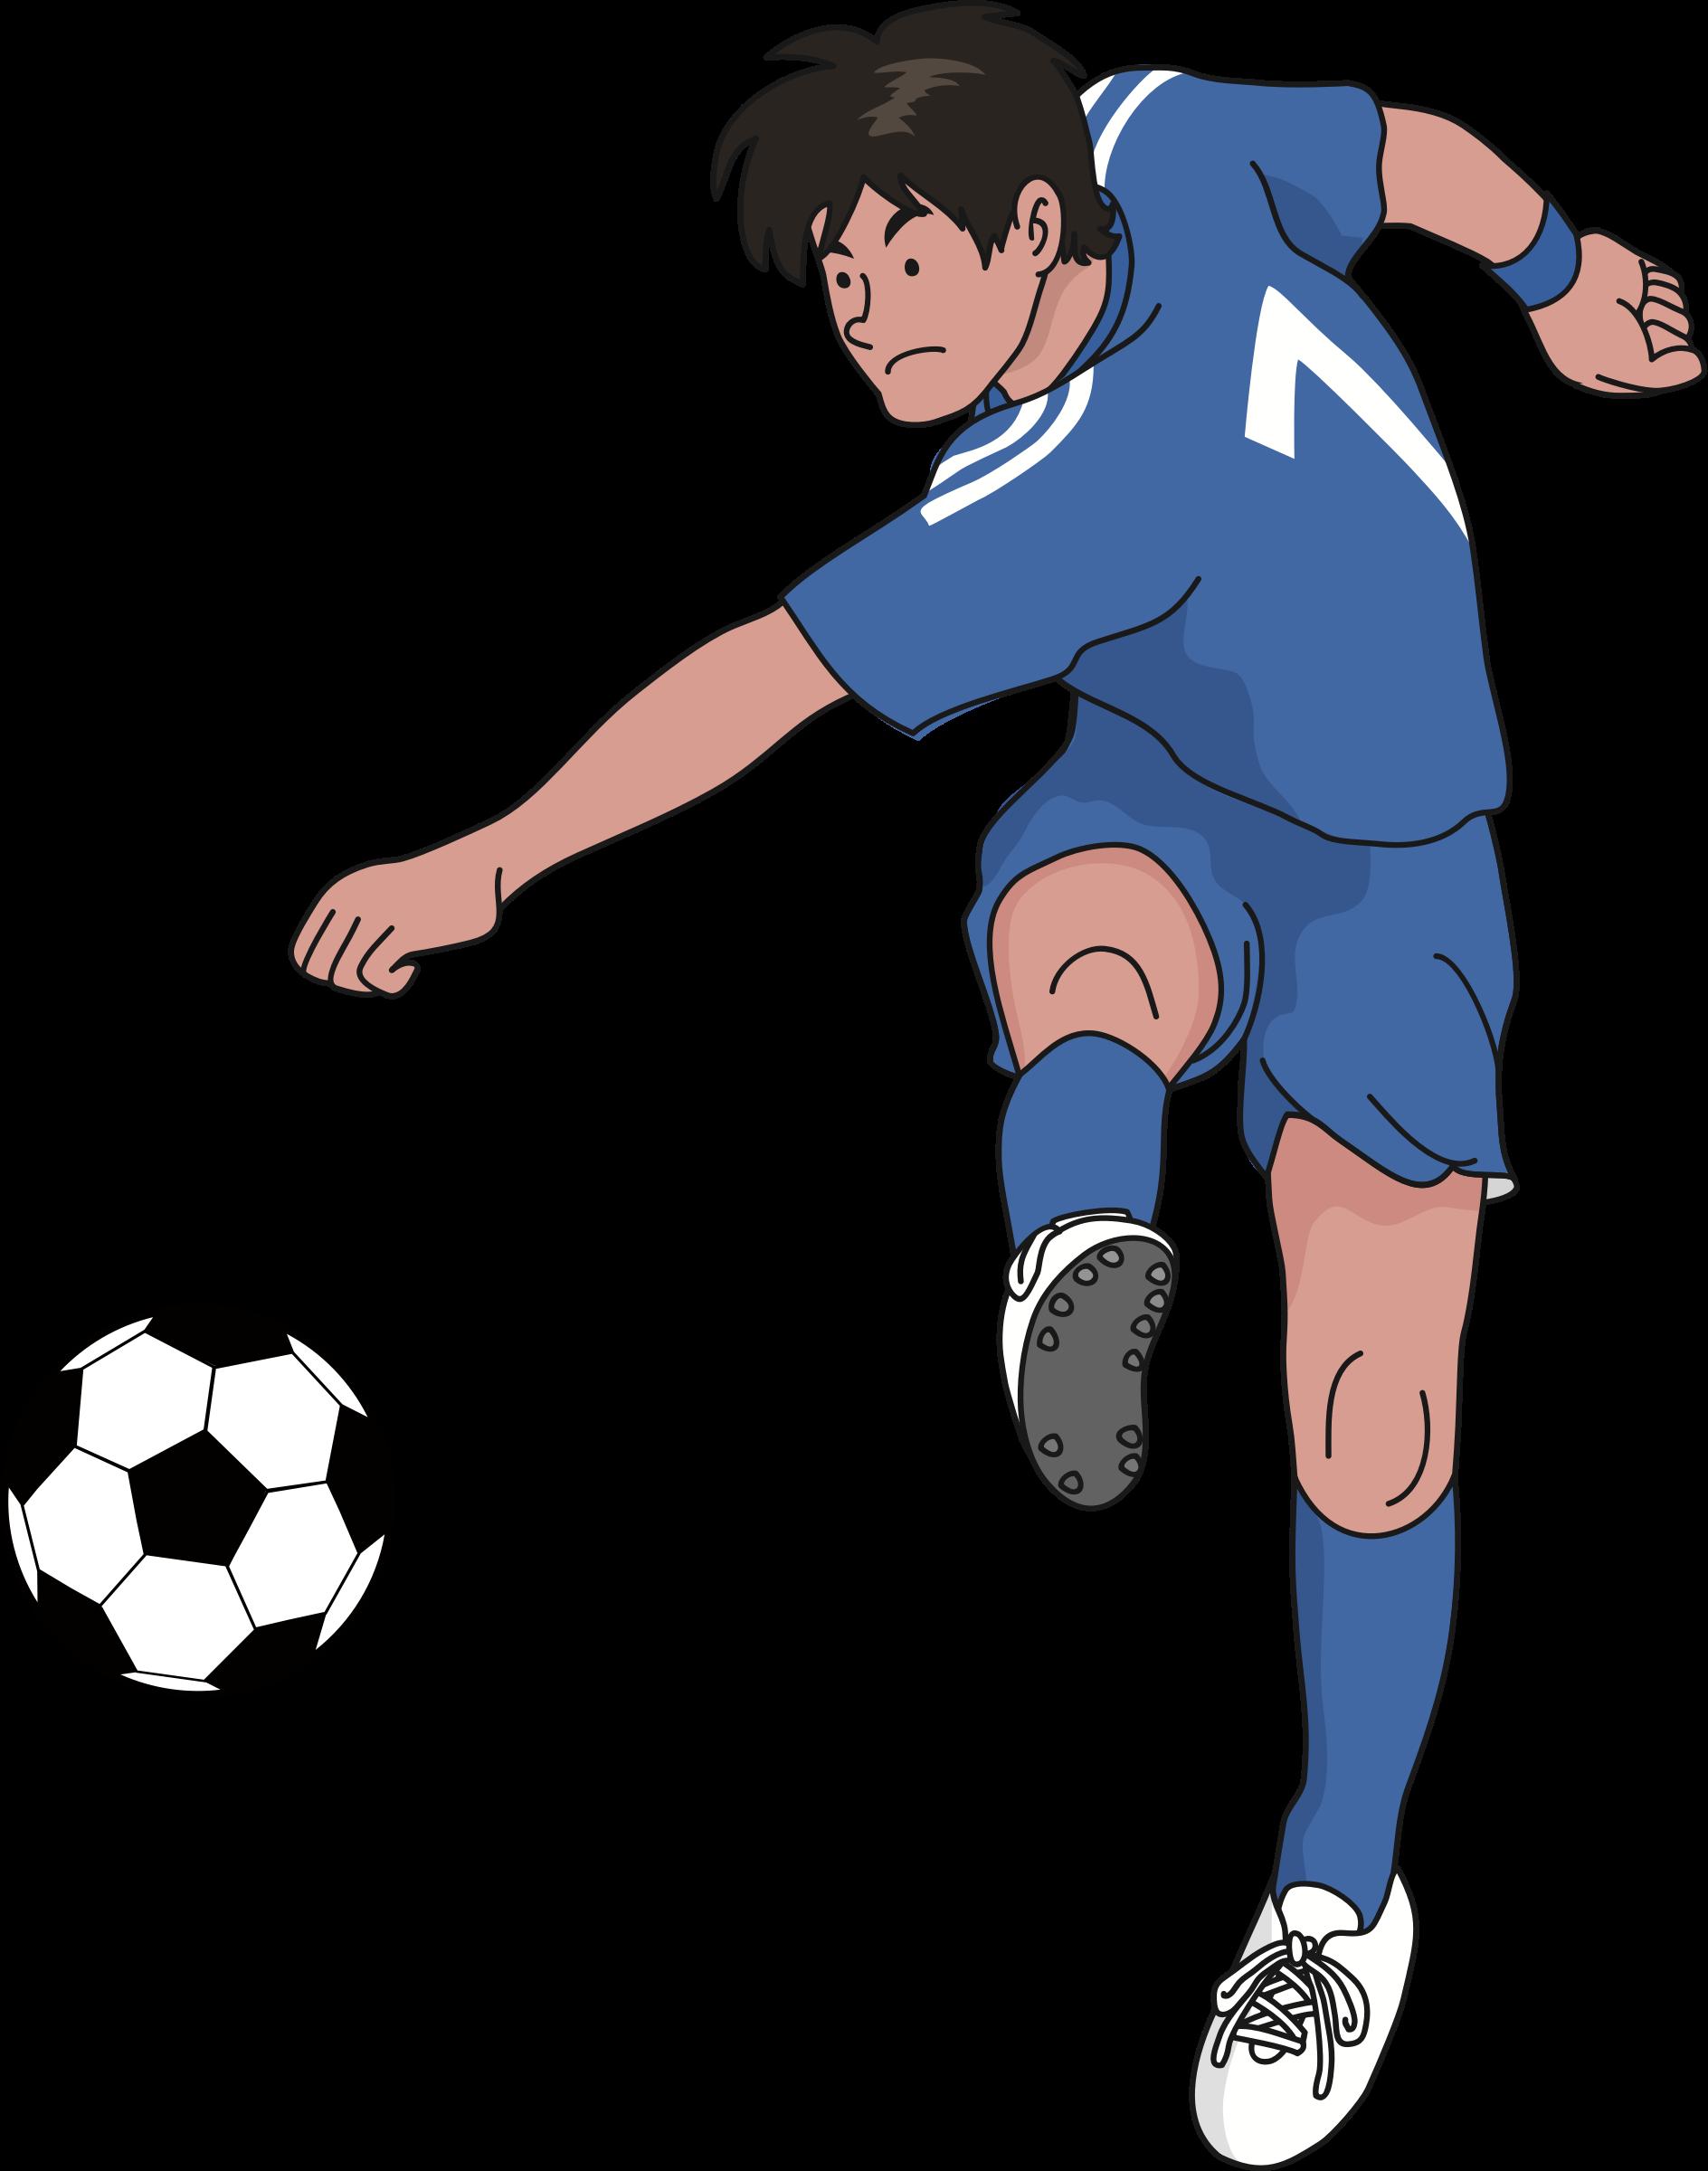 Soccer player big image. Clipart football man